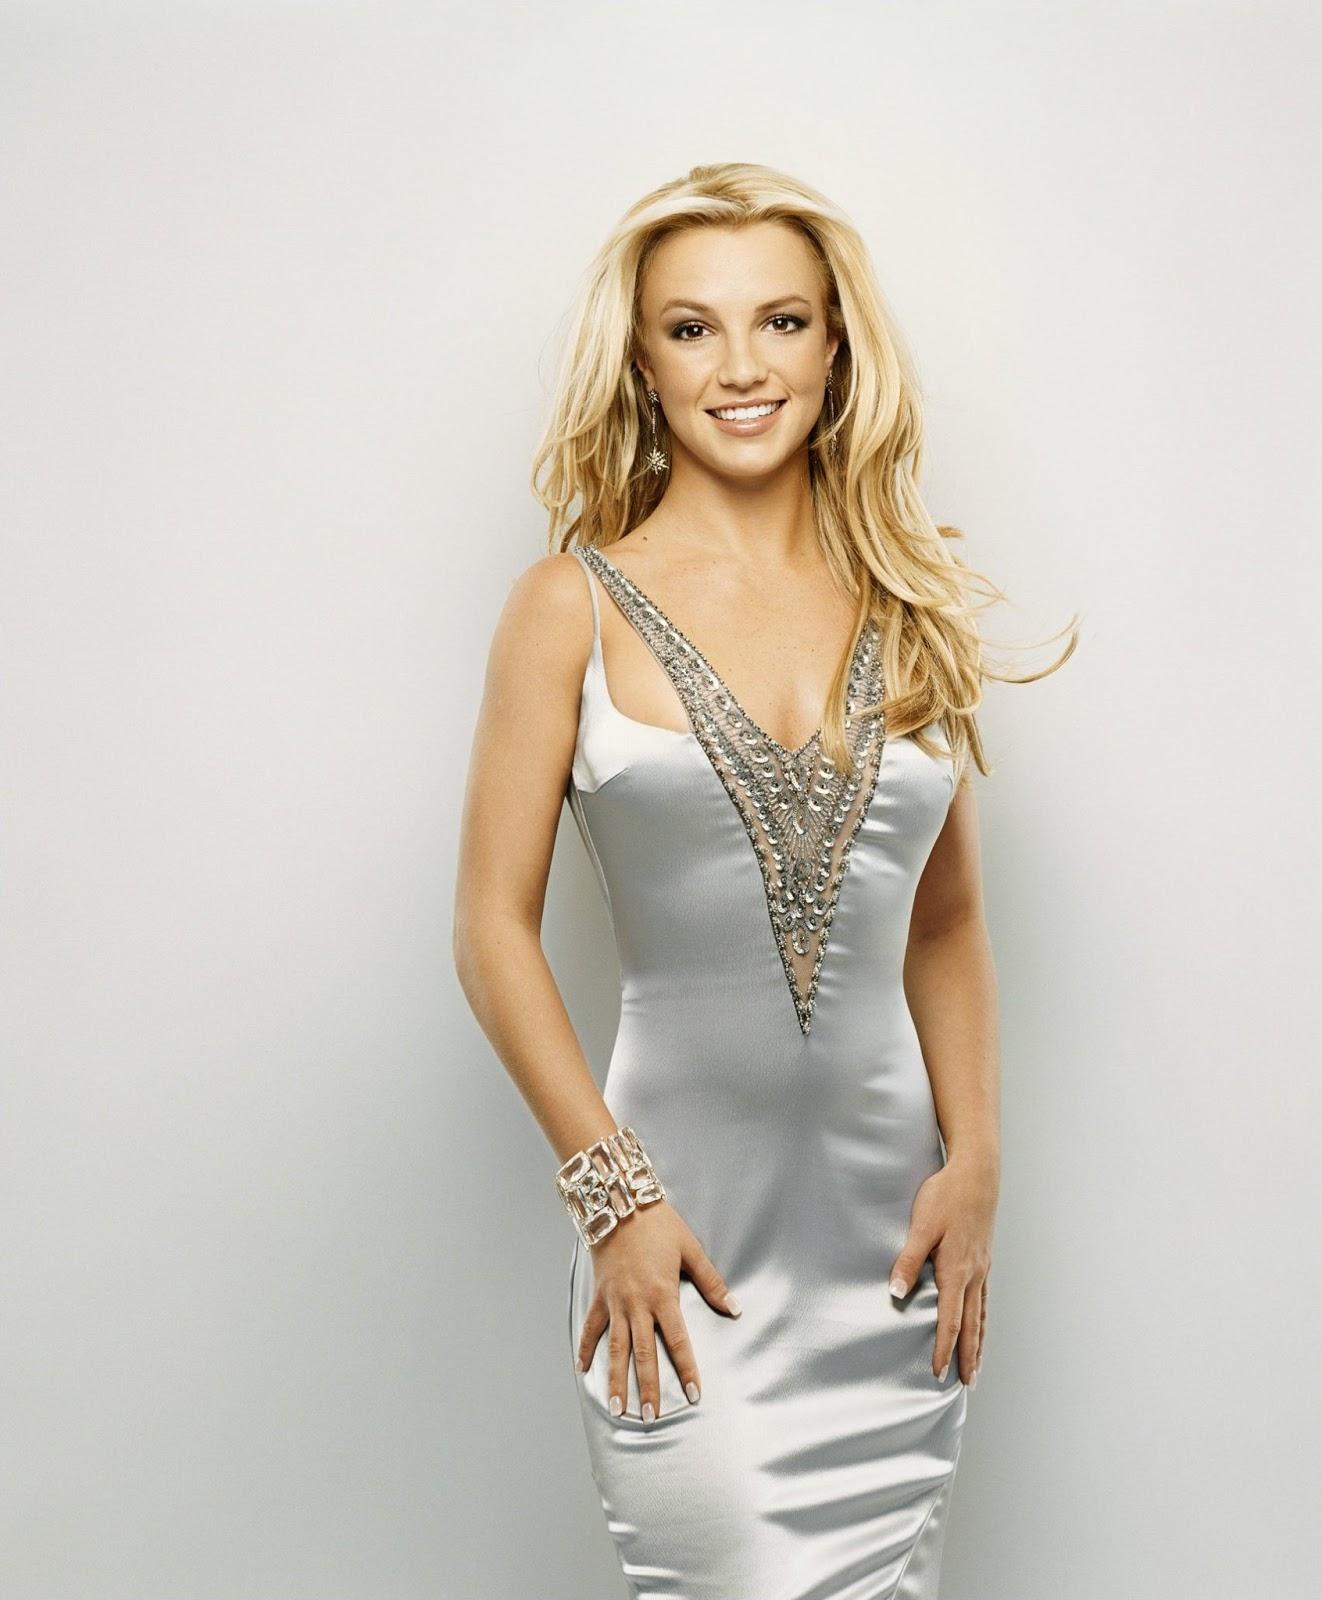 Britney Spears: Britney Spears Hot Photoshoot